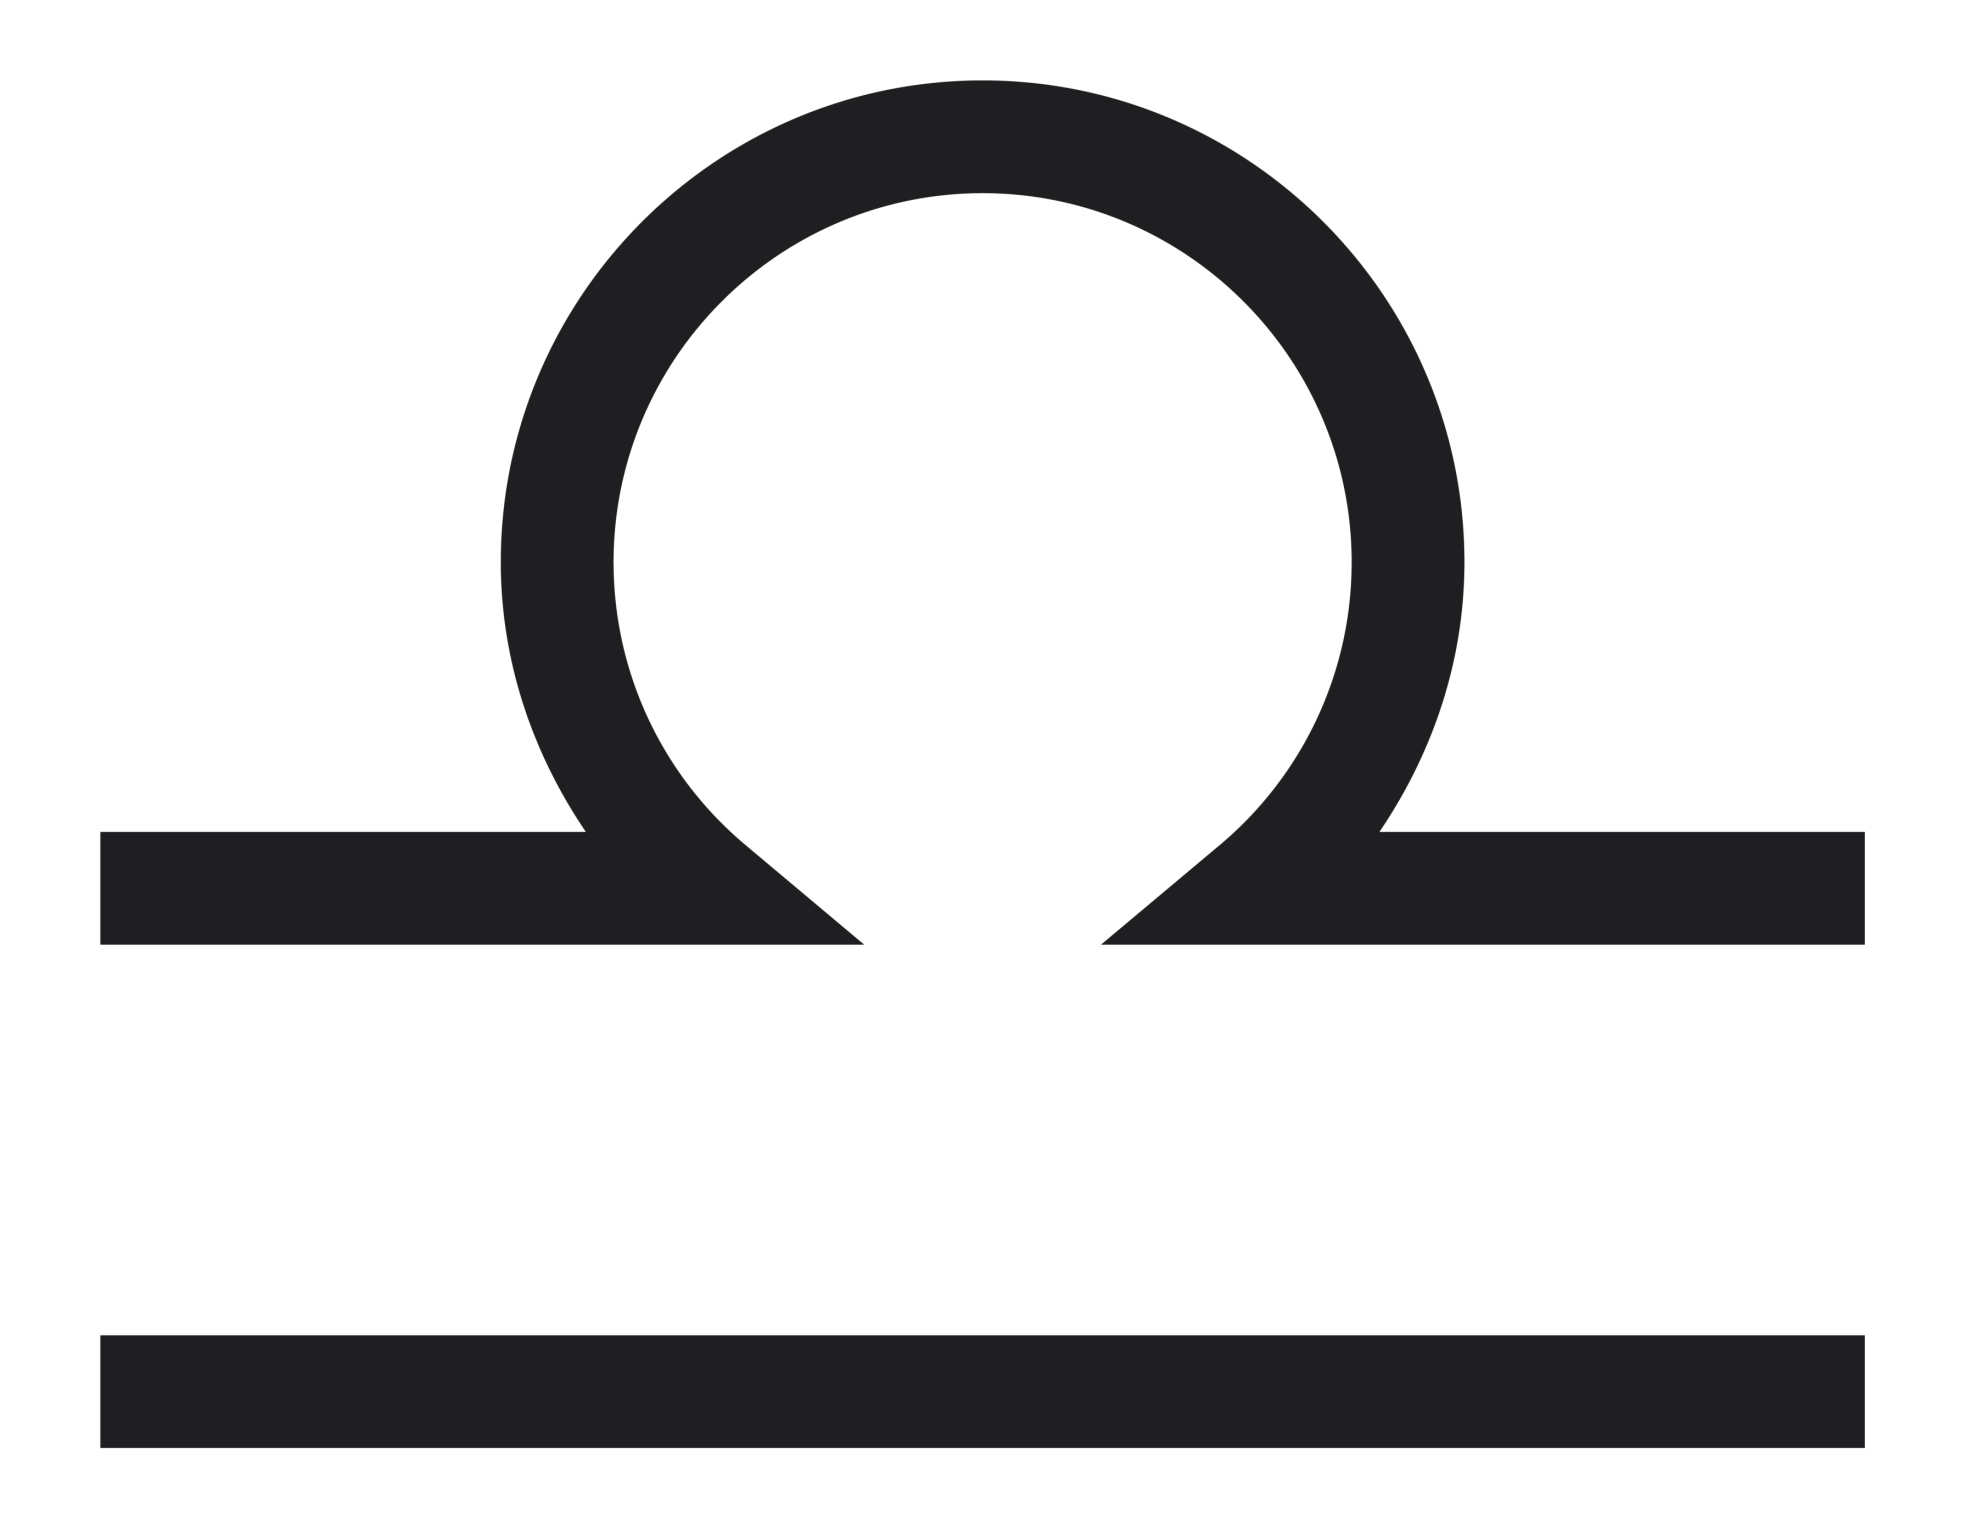 Символ Весов